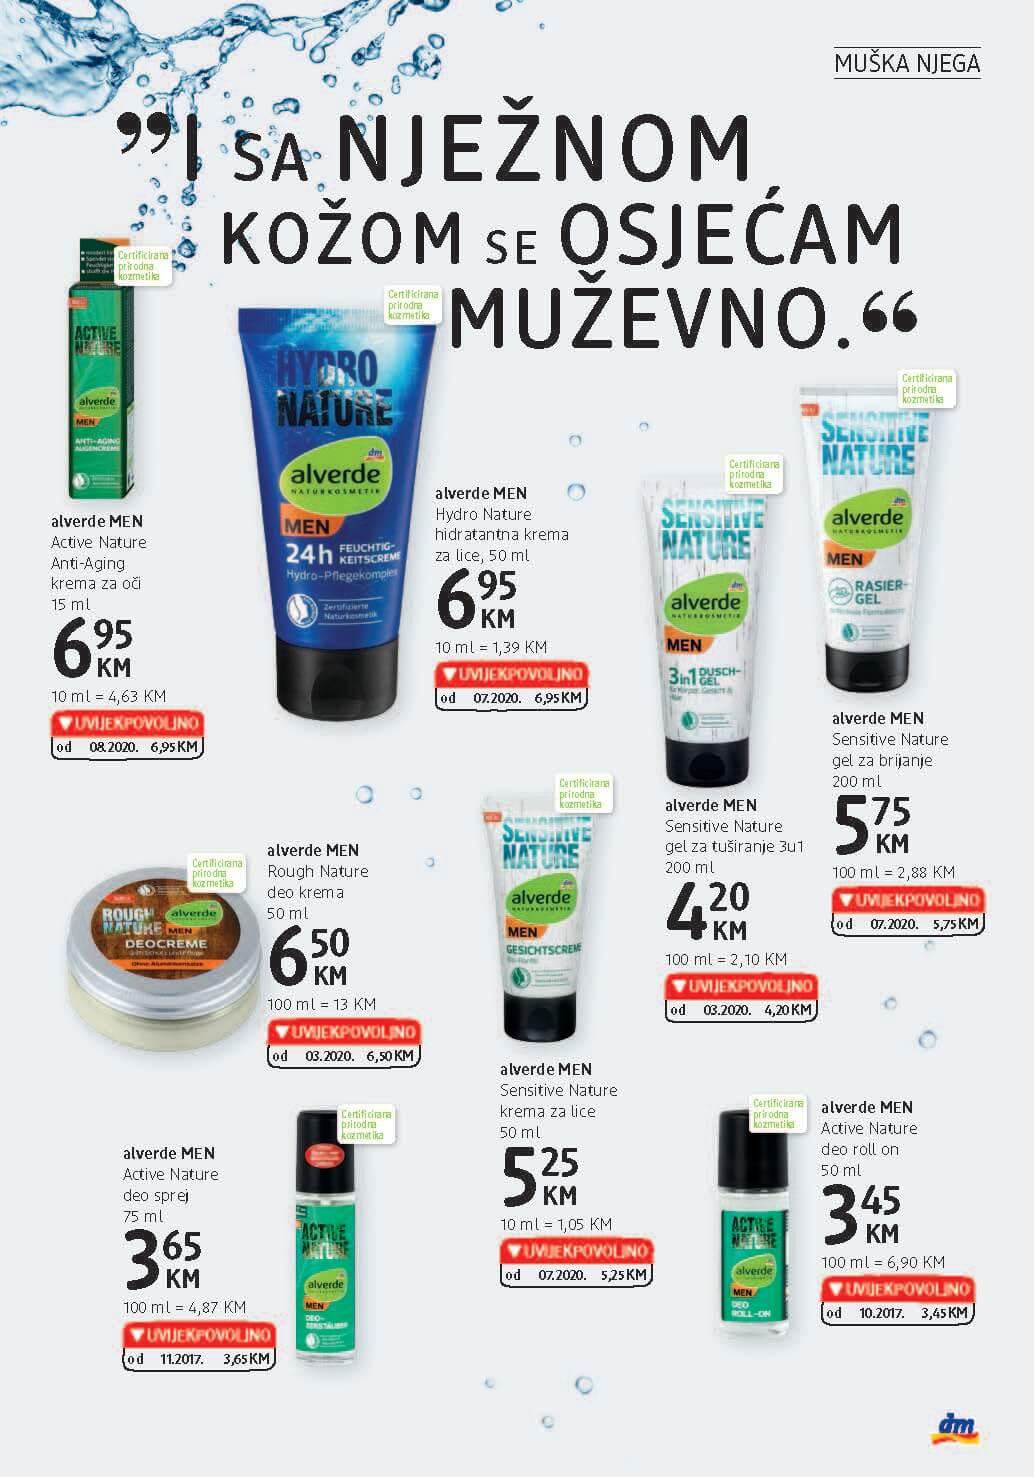 DM Katalog BiH JUN 2021 09.06. 22.06. eKatalozi.com PR Page 09